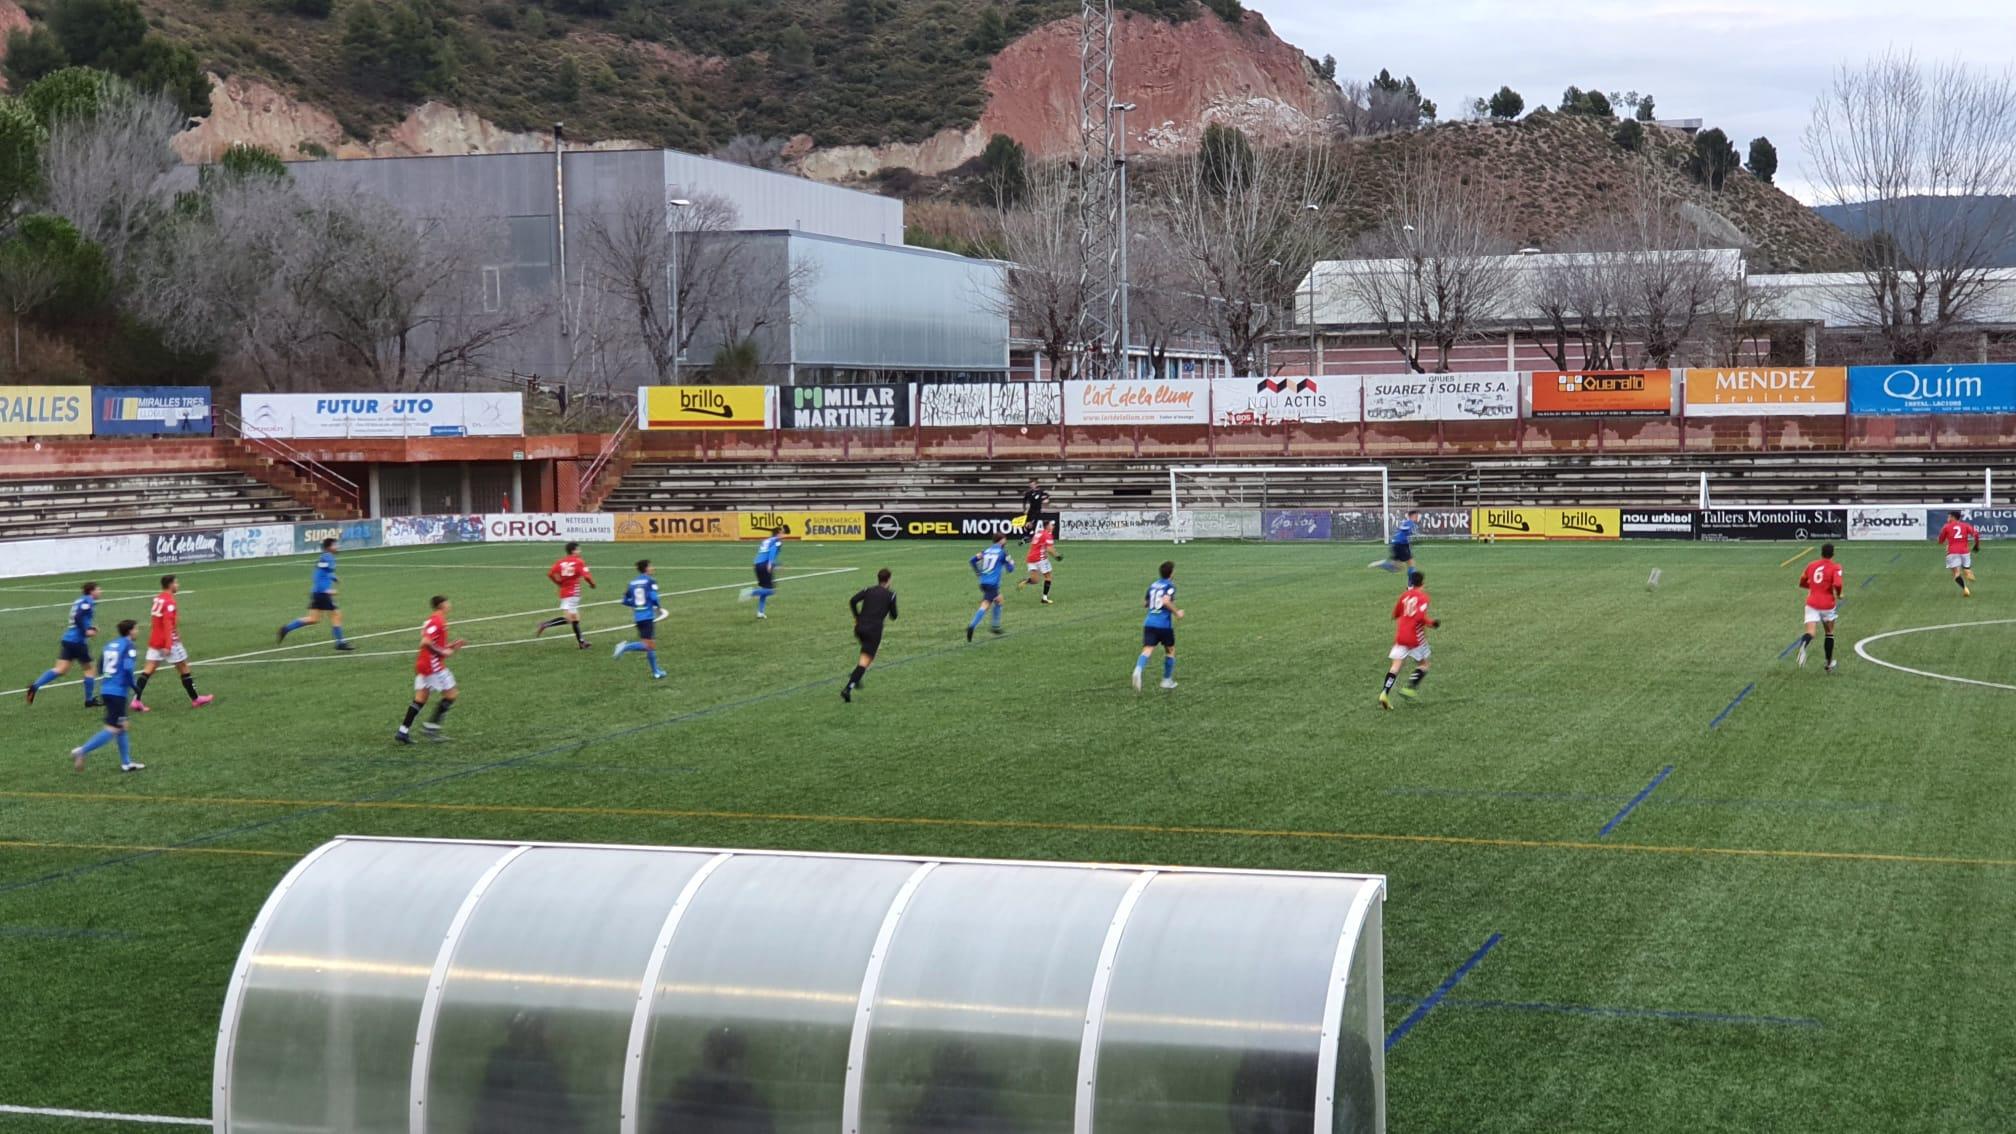 Victòria del CF Pobla de Mafumet davant el CF Igualada per 0-3